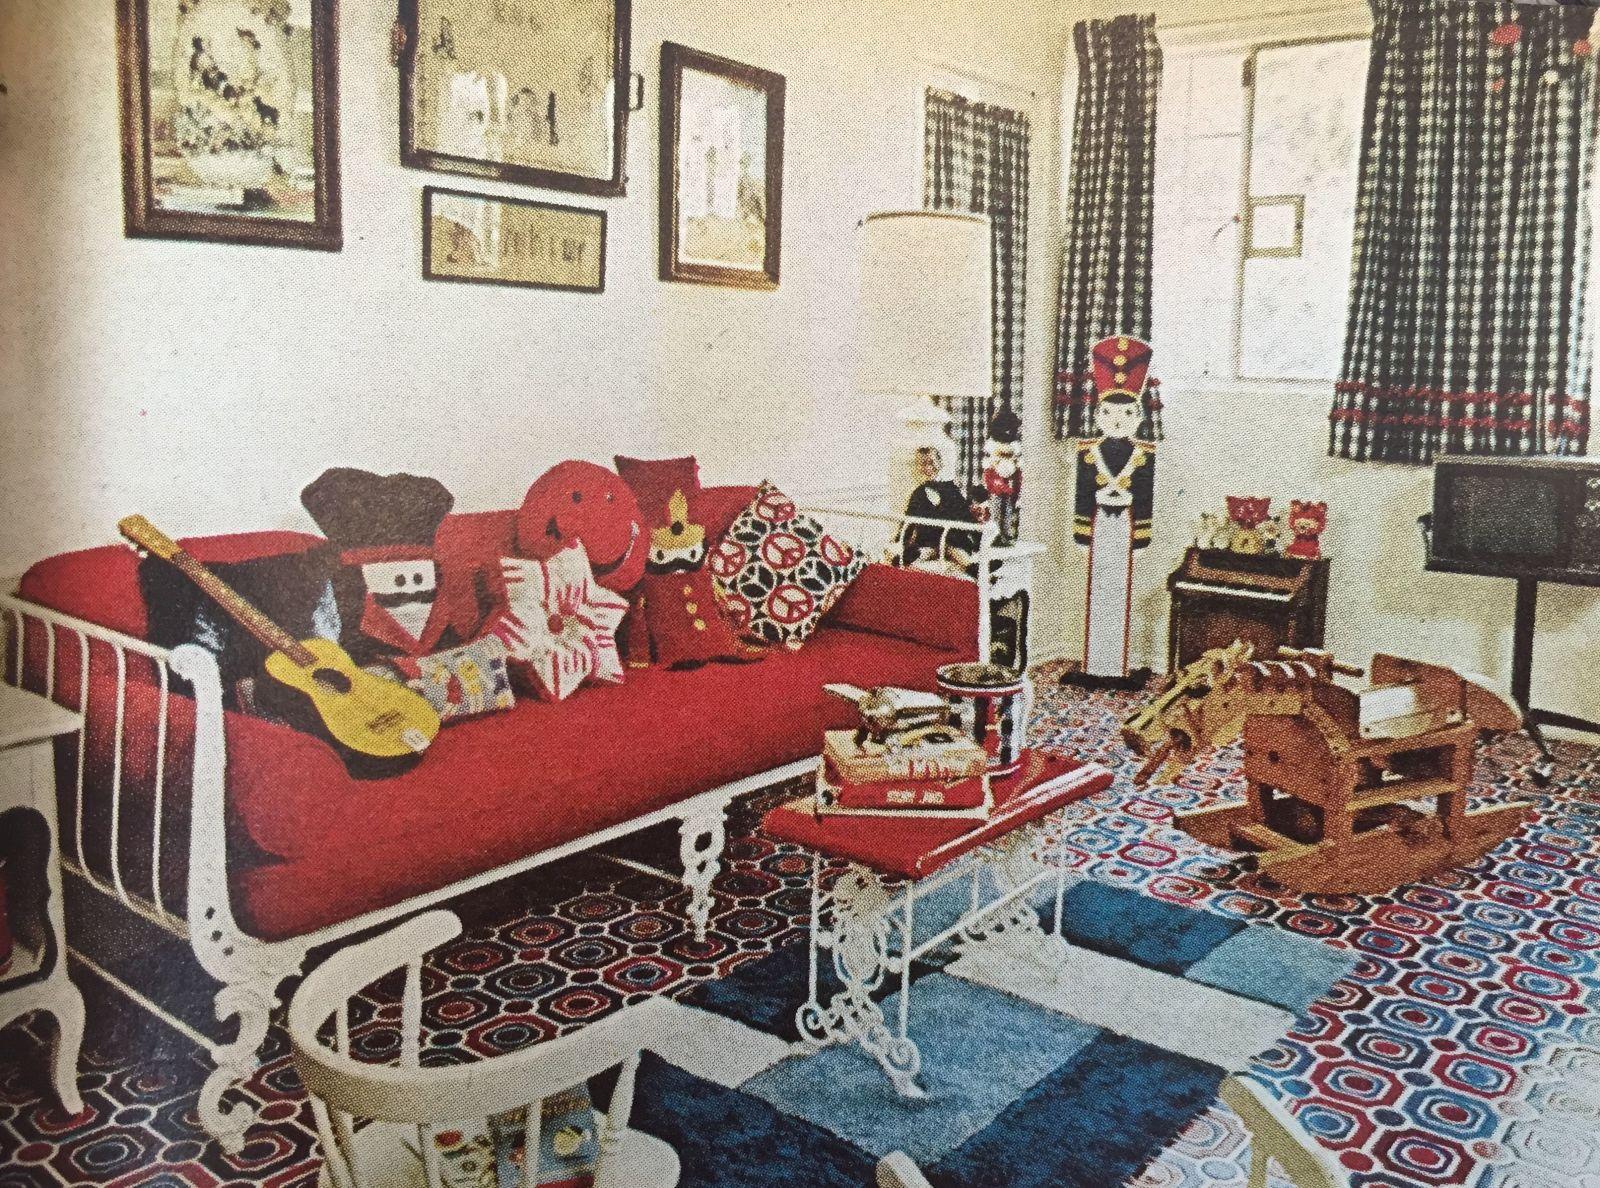 Barbra Streisand House Tour August 1974 House Beautiful